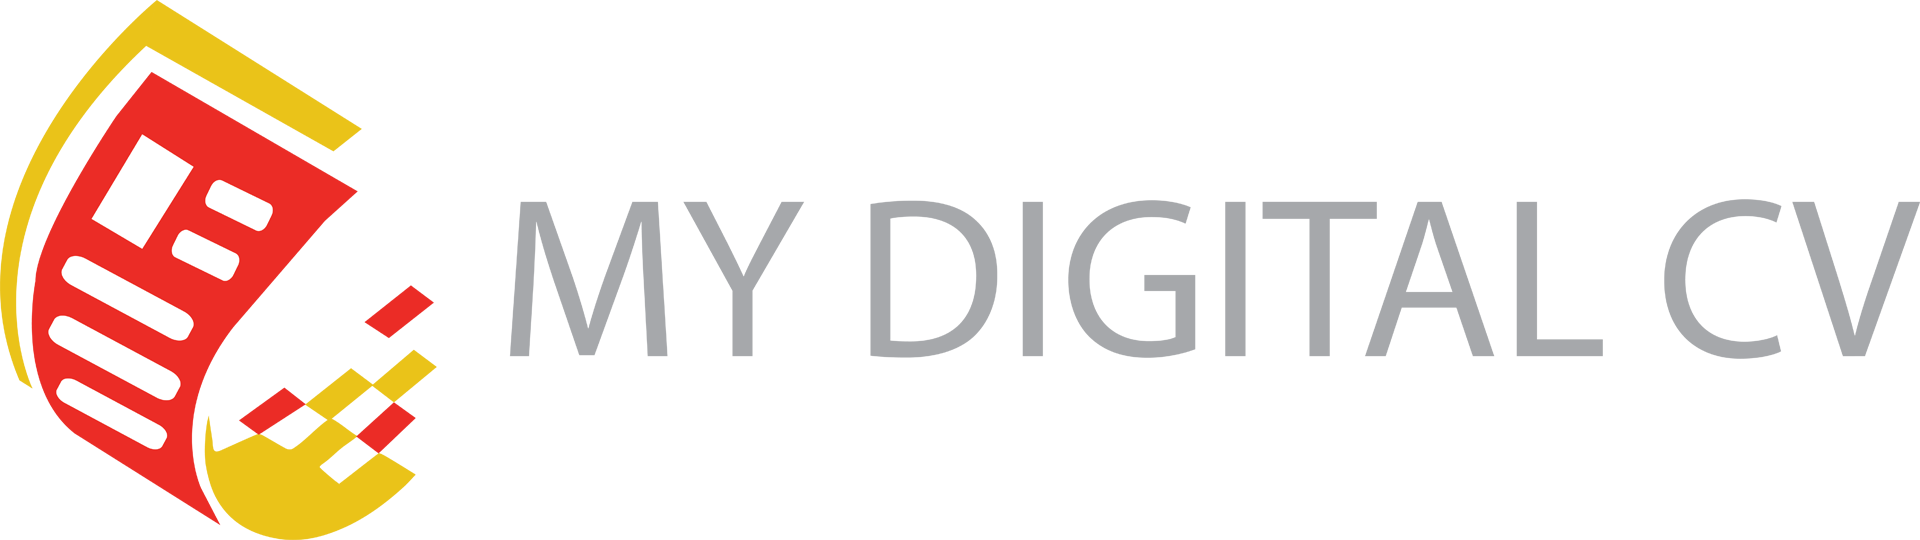 My Digital CV